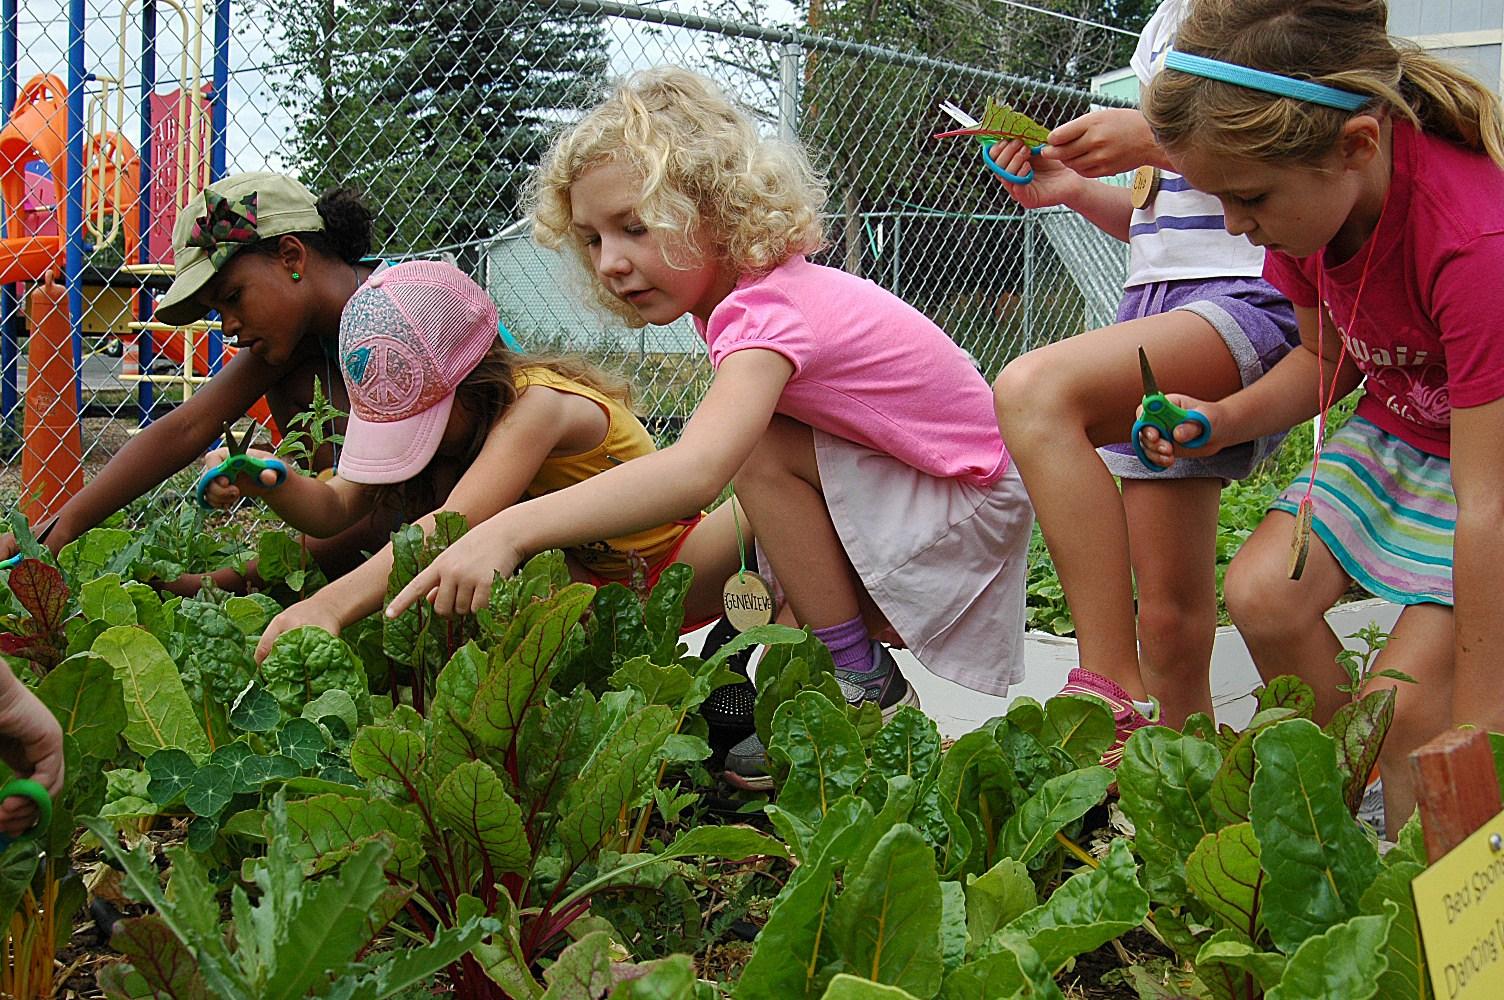 Kids in garden.